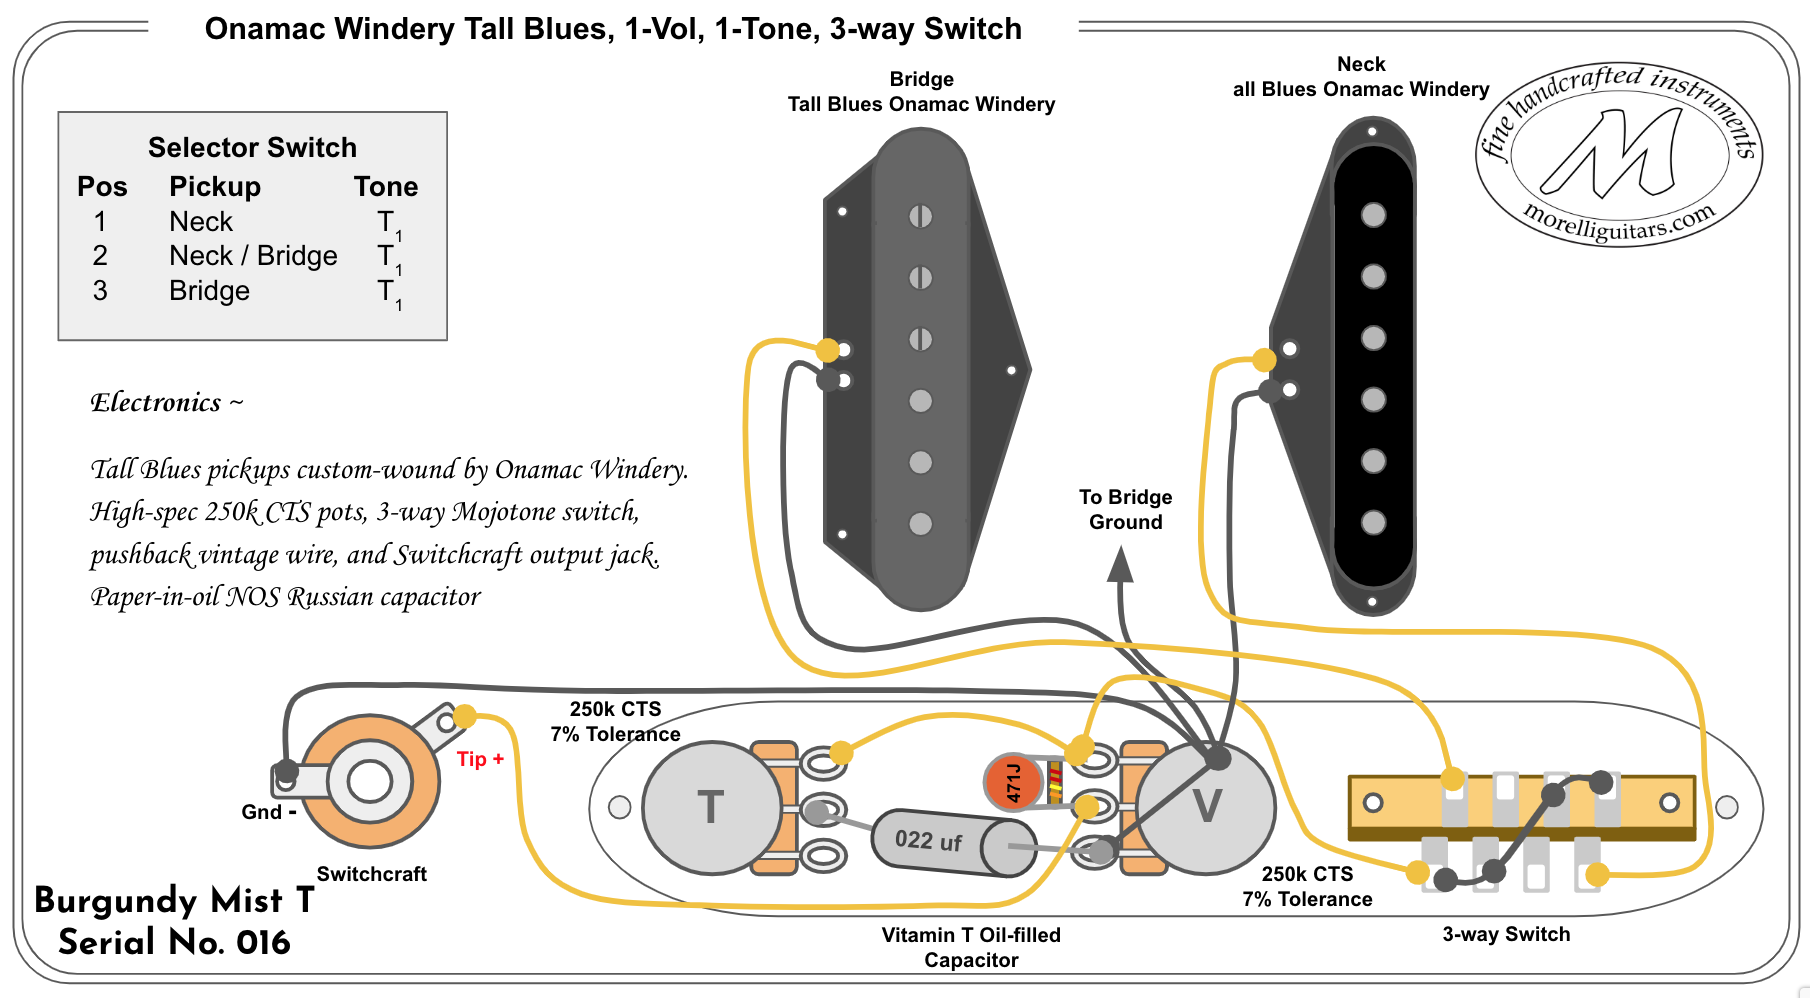 onamac windery tall blues 1 vol 1 tone 3 way switch. Black Bedroom Furniture Sets. Home Design Ideas